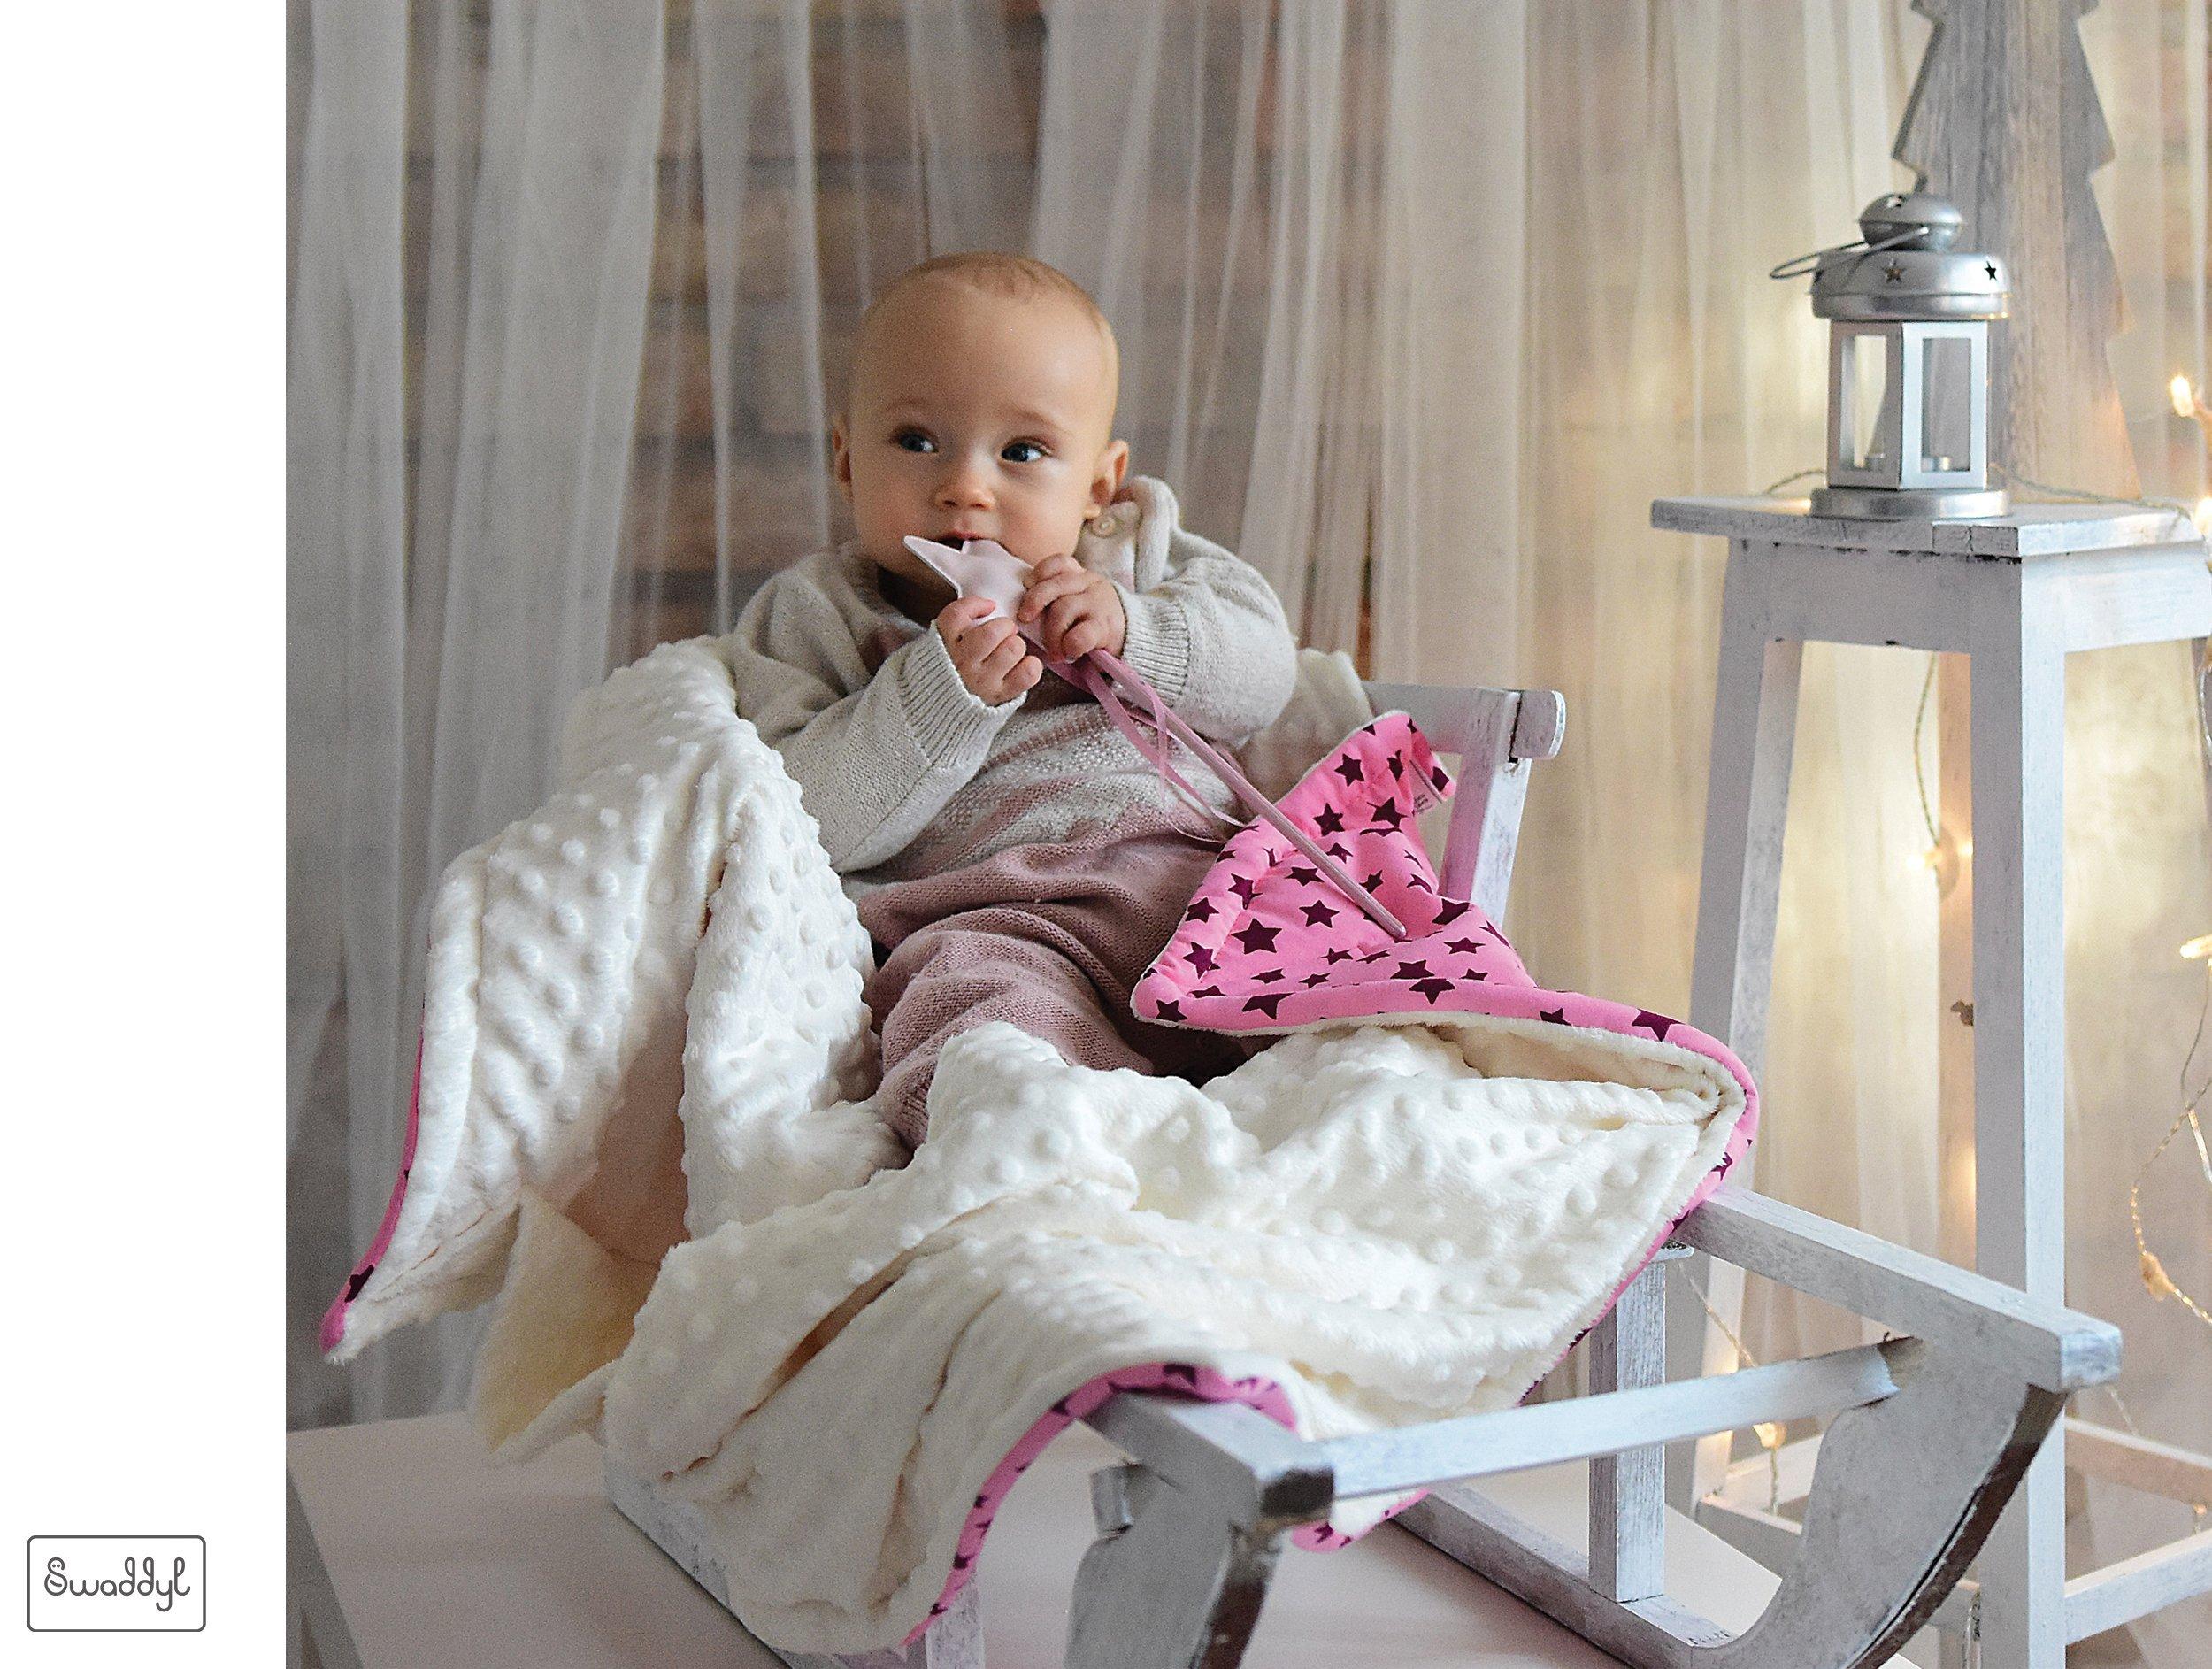 SWADDYL Baby girl swaddle blanket I car seat I stroller I hooded I bunting I newborn I Minky plush and cotton I Made in Europe (RoseHeart) by Swaddyl (Image #4)